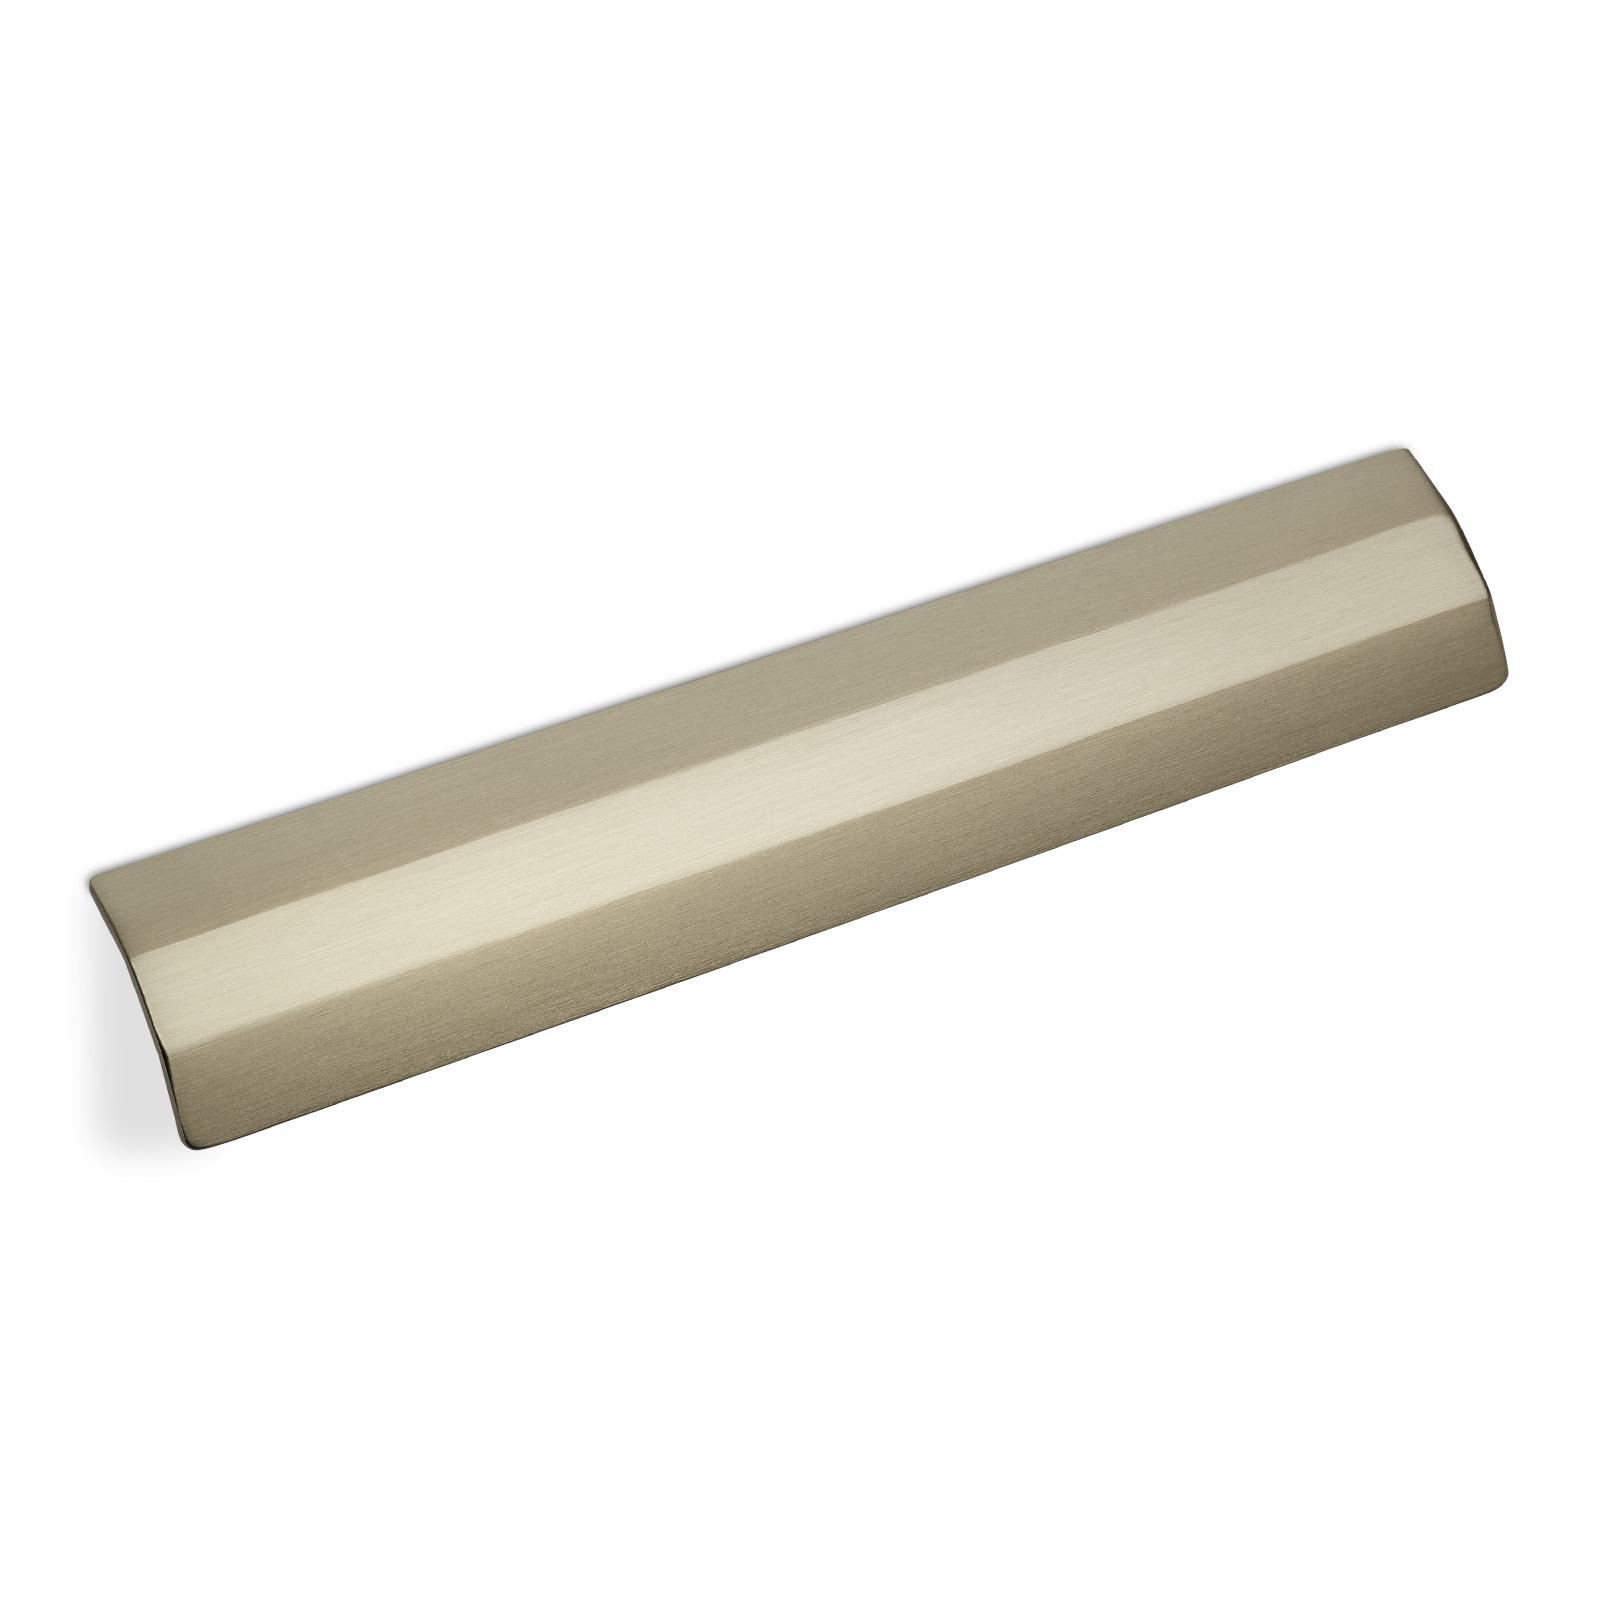 SO-TECH/® M/öbelgriff Edelstahloptik BA 160 mm